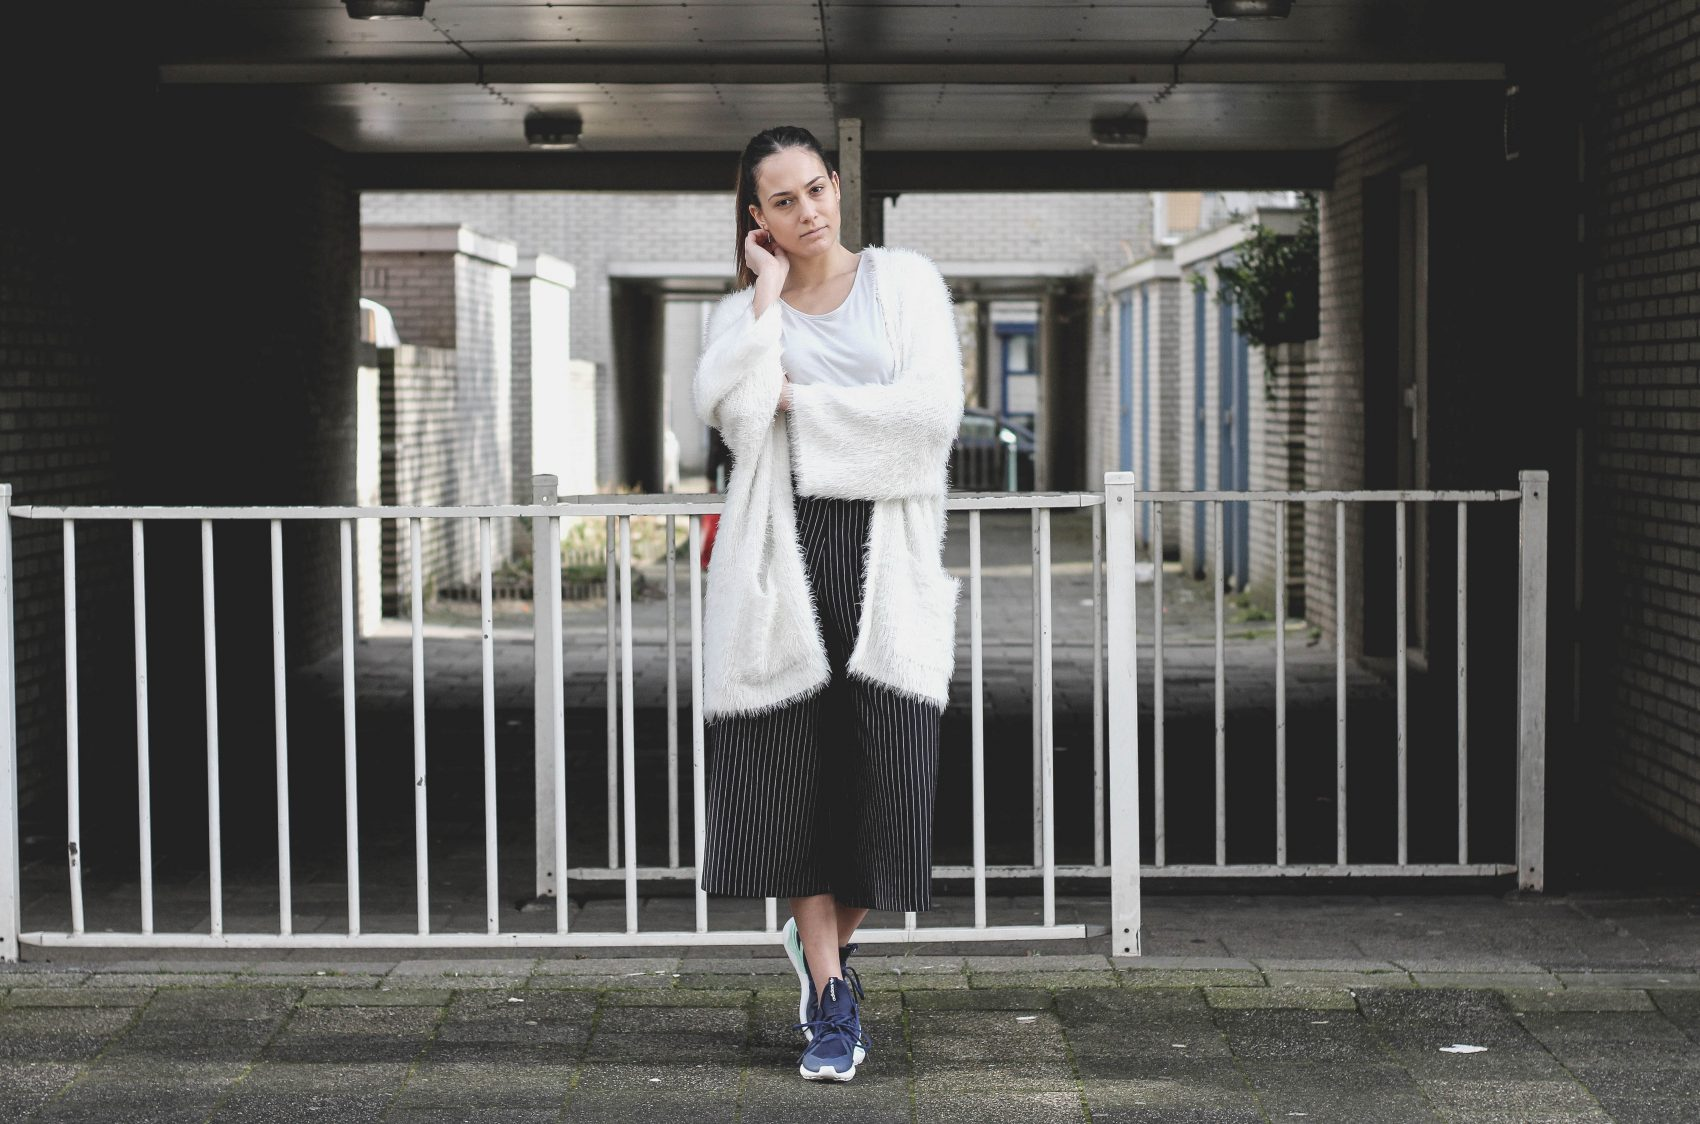 rosemunde copenhagen outfit post on www.quitealooker.com